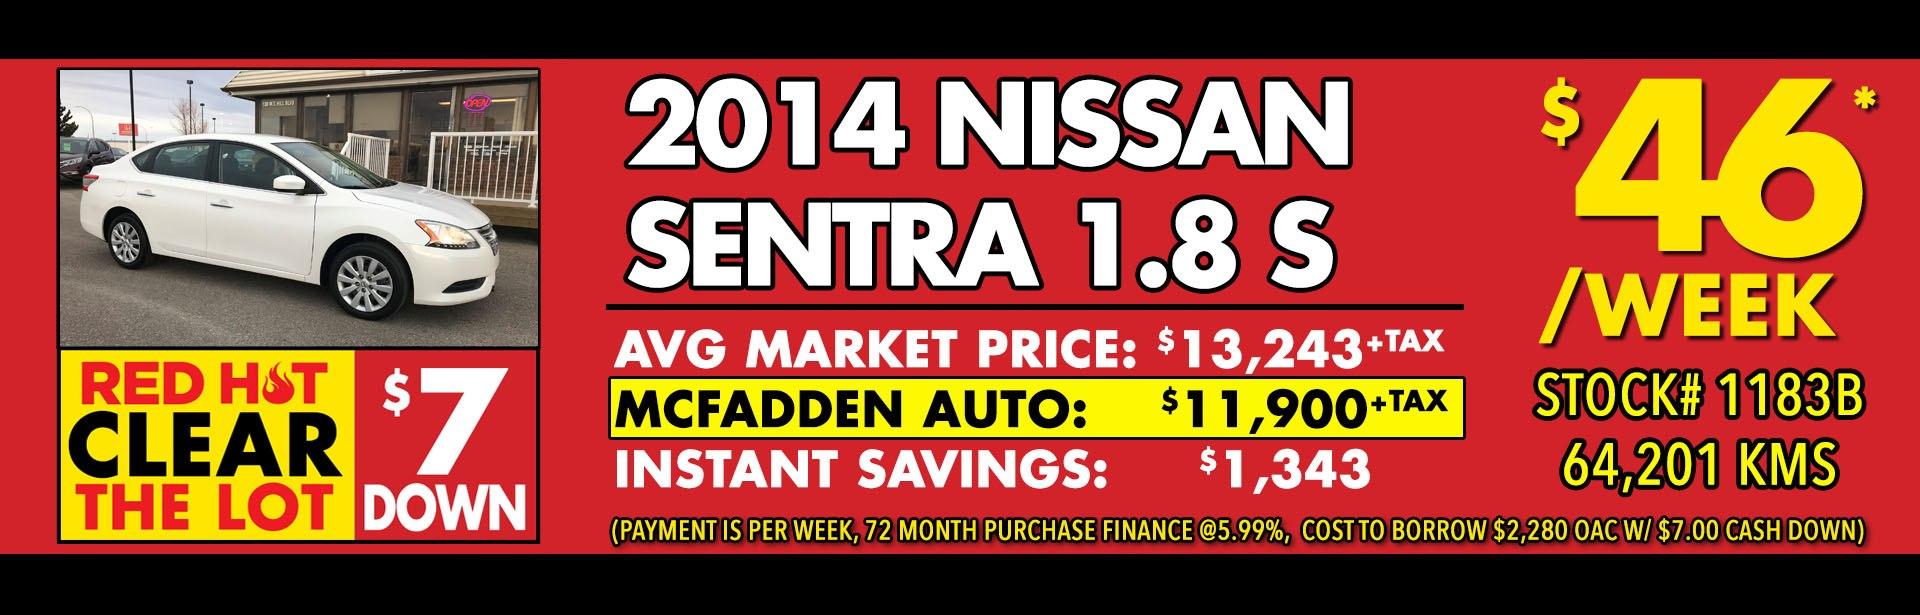 Red Hot - 1183B 2014 Nissan Sentra S - Mar 2018